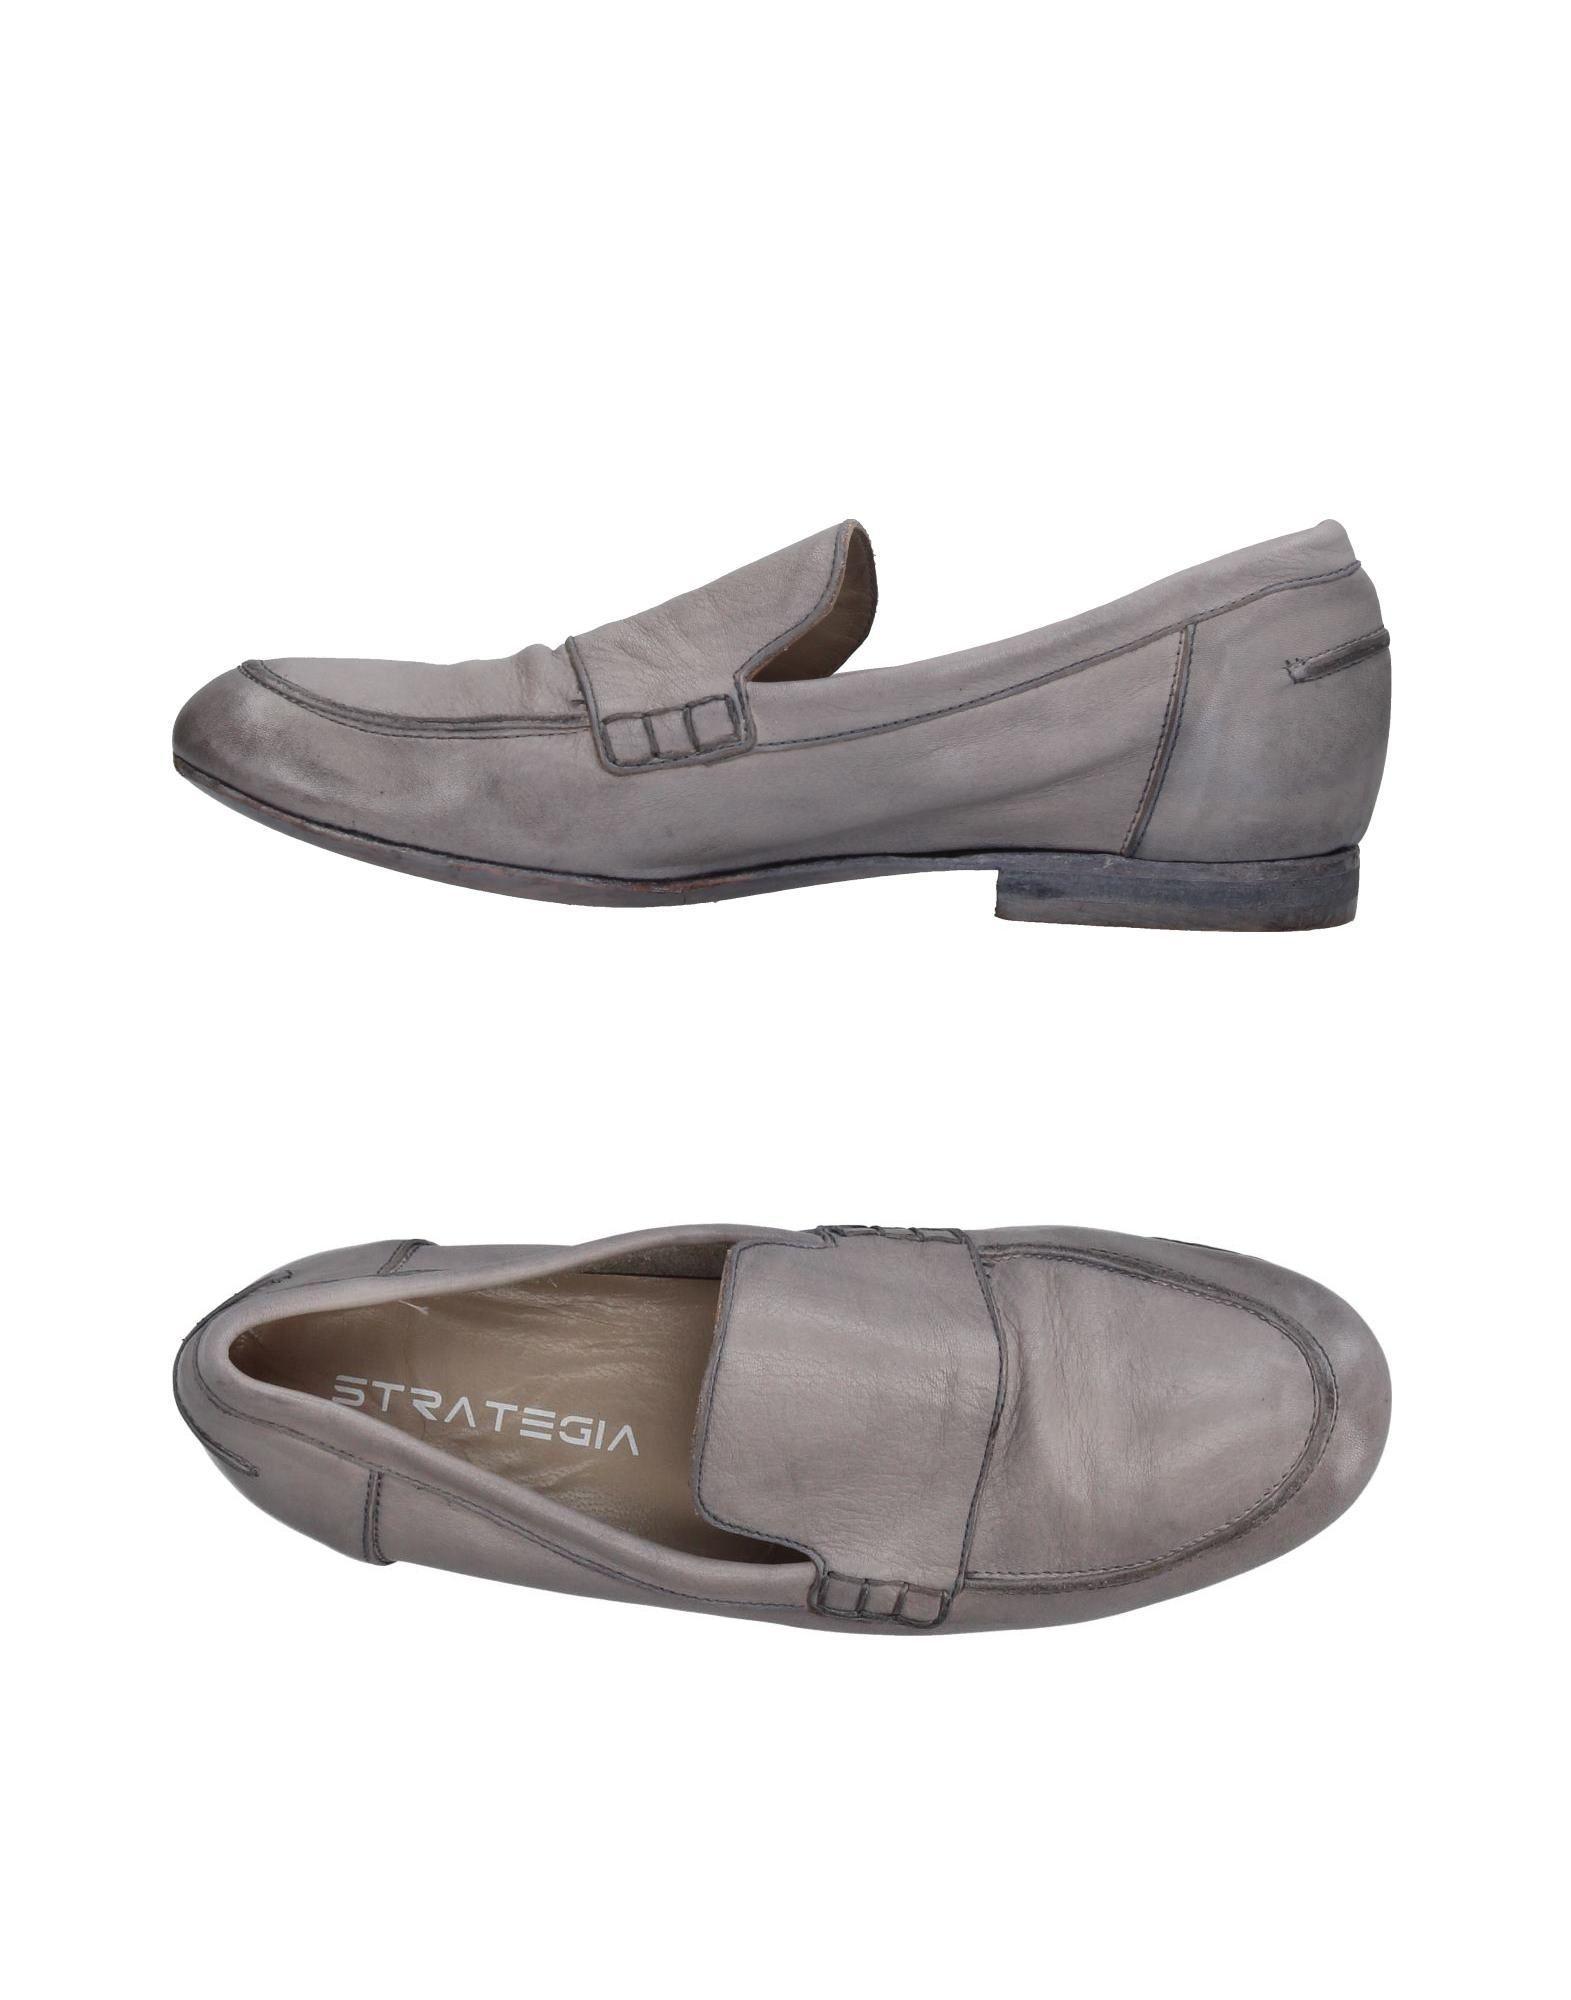 Strategia Mokassins Damen  11368091VW Gute Qualität beliebte Schuhe